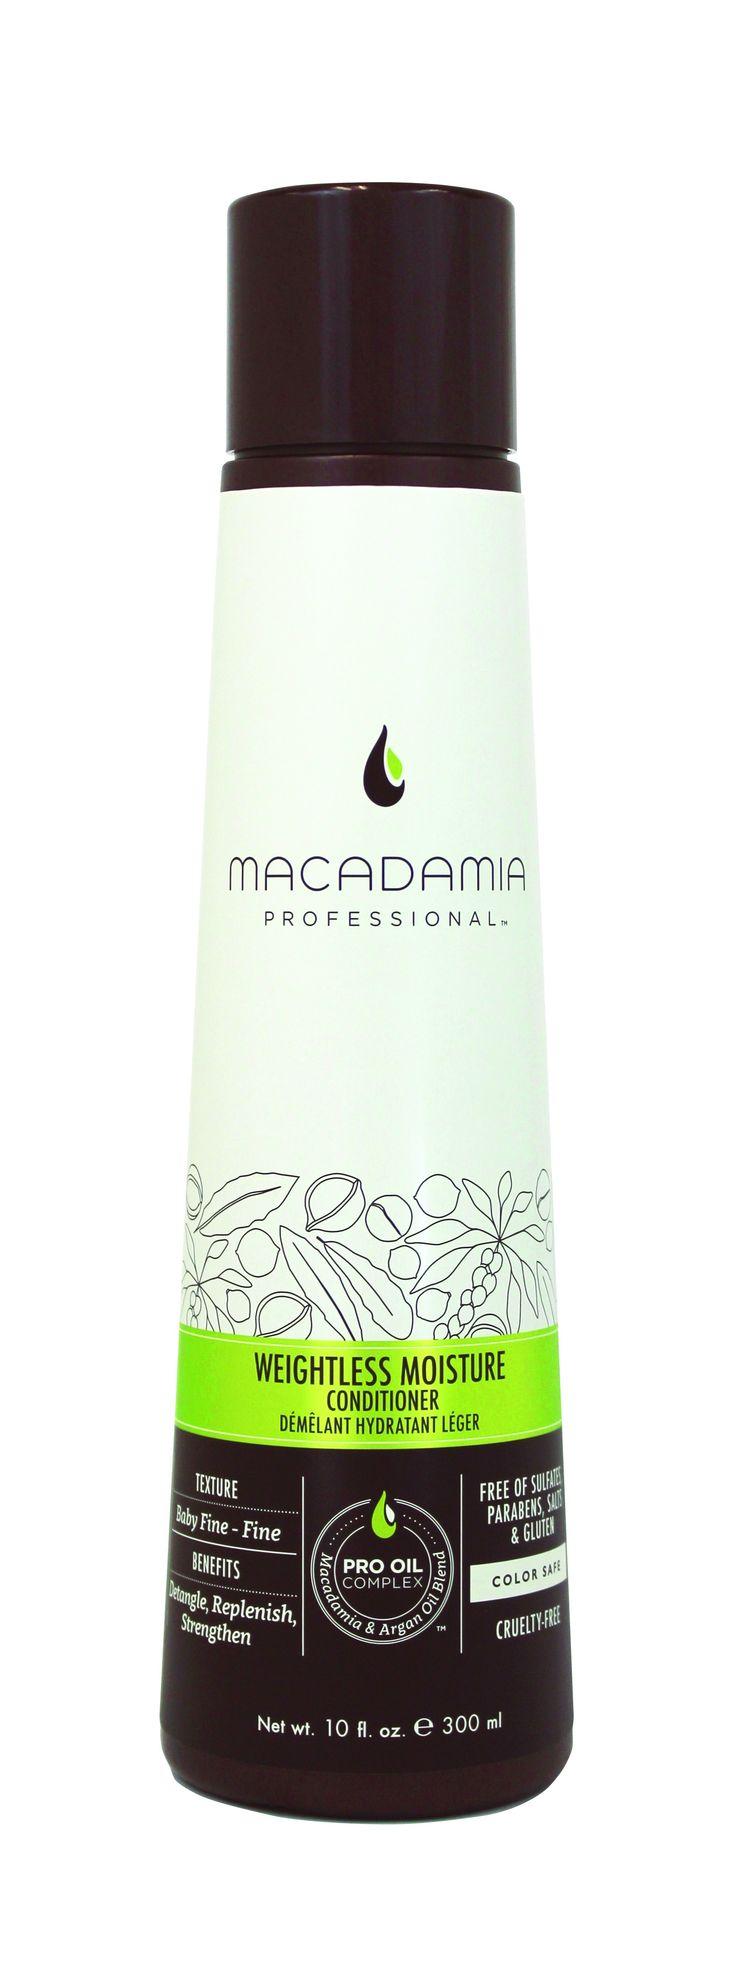 Macadamia Professional Weightless Moisture Conditioner 300ml.